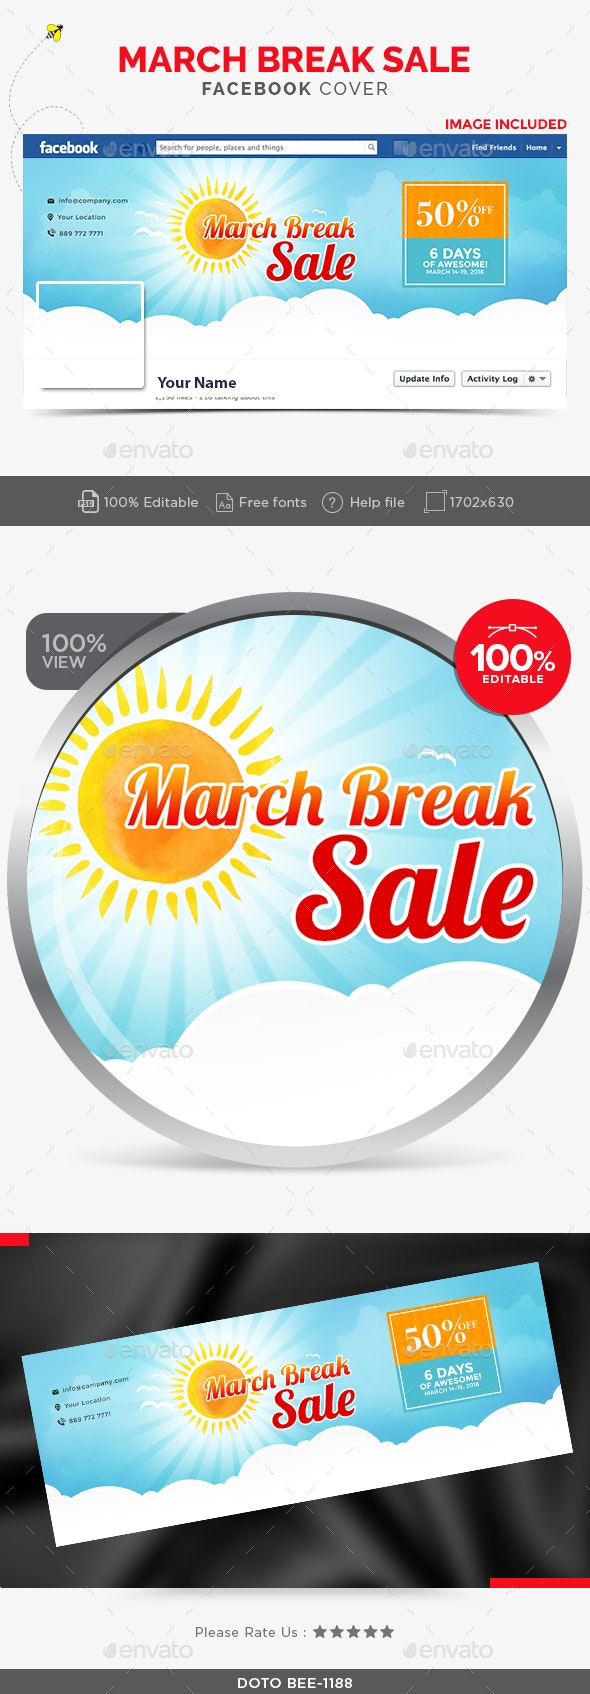 March Break Sale Facebook Cover - Facebook Timeline Covers Social Media